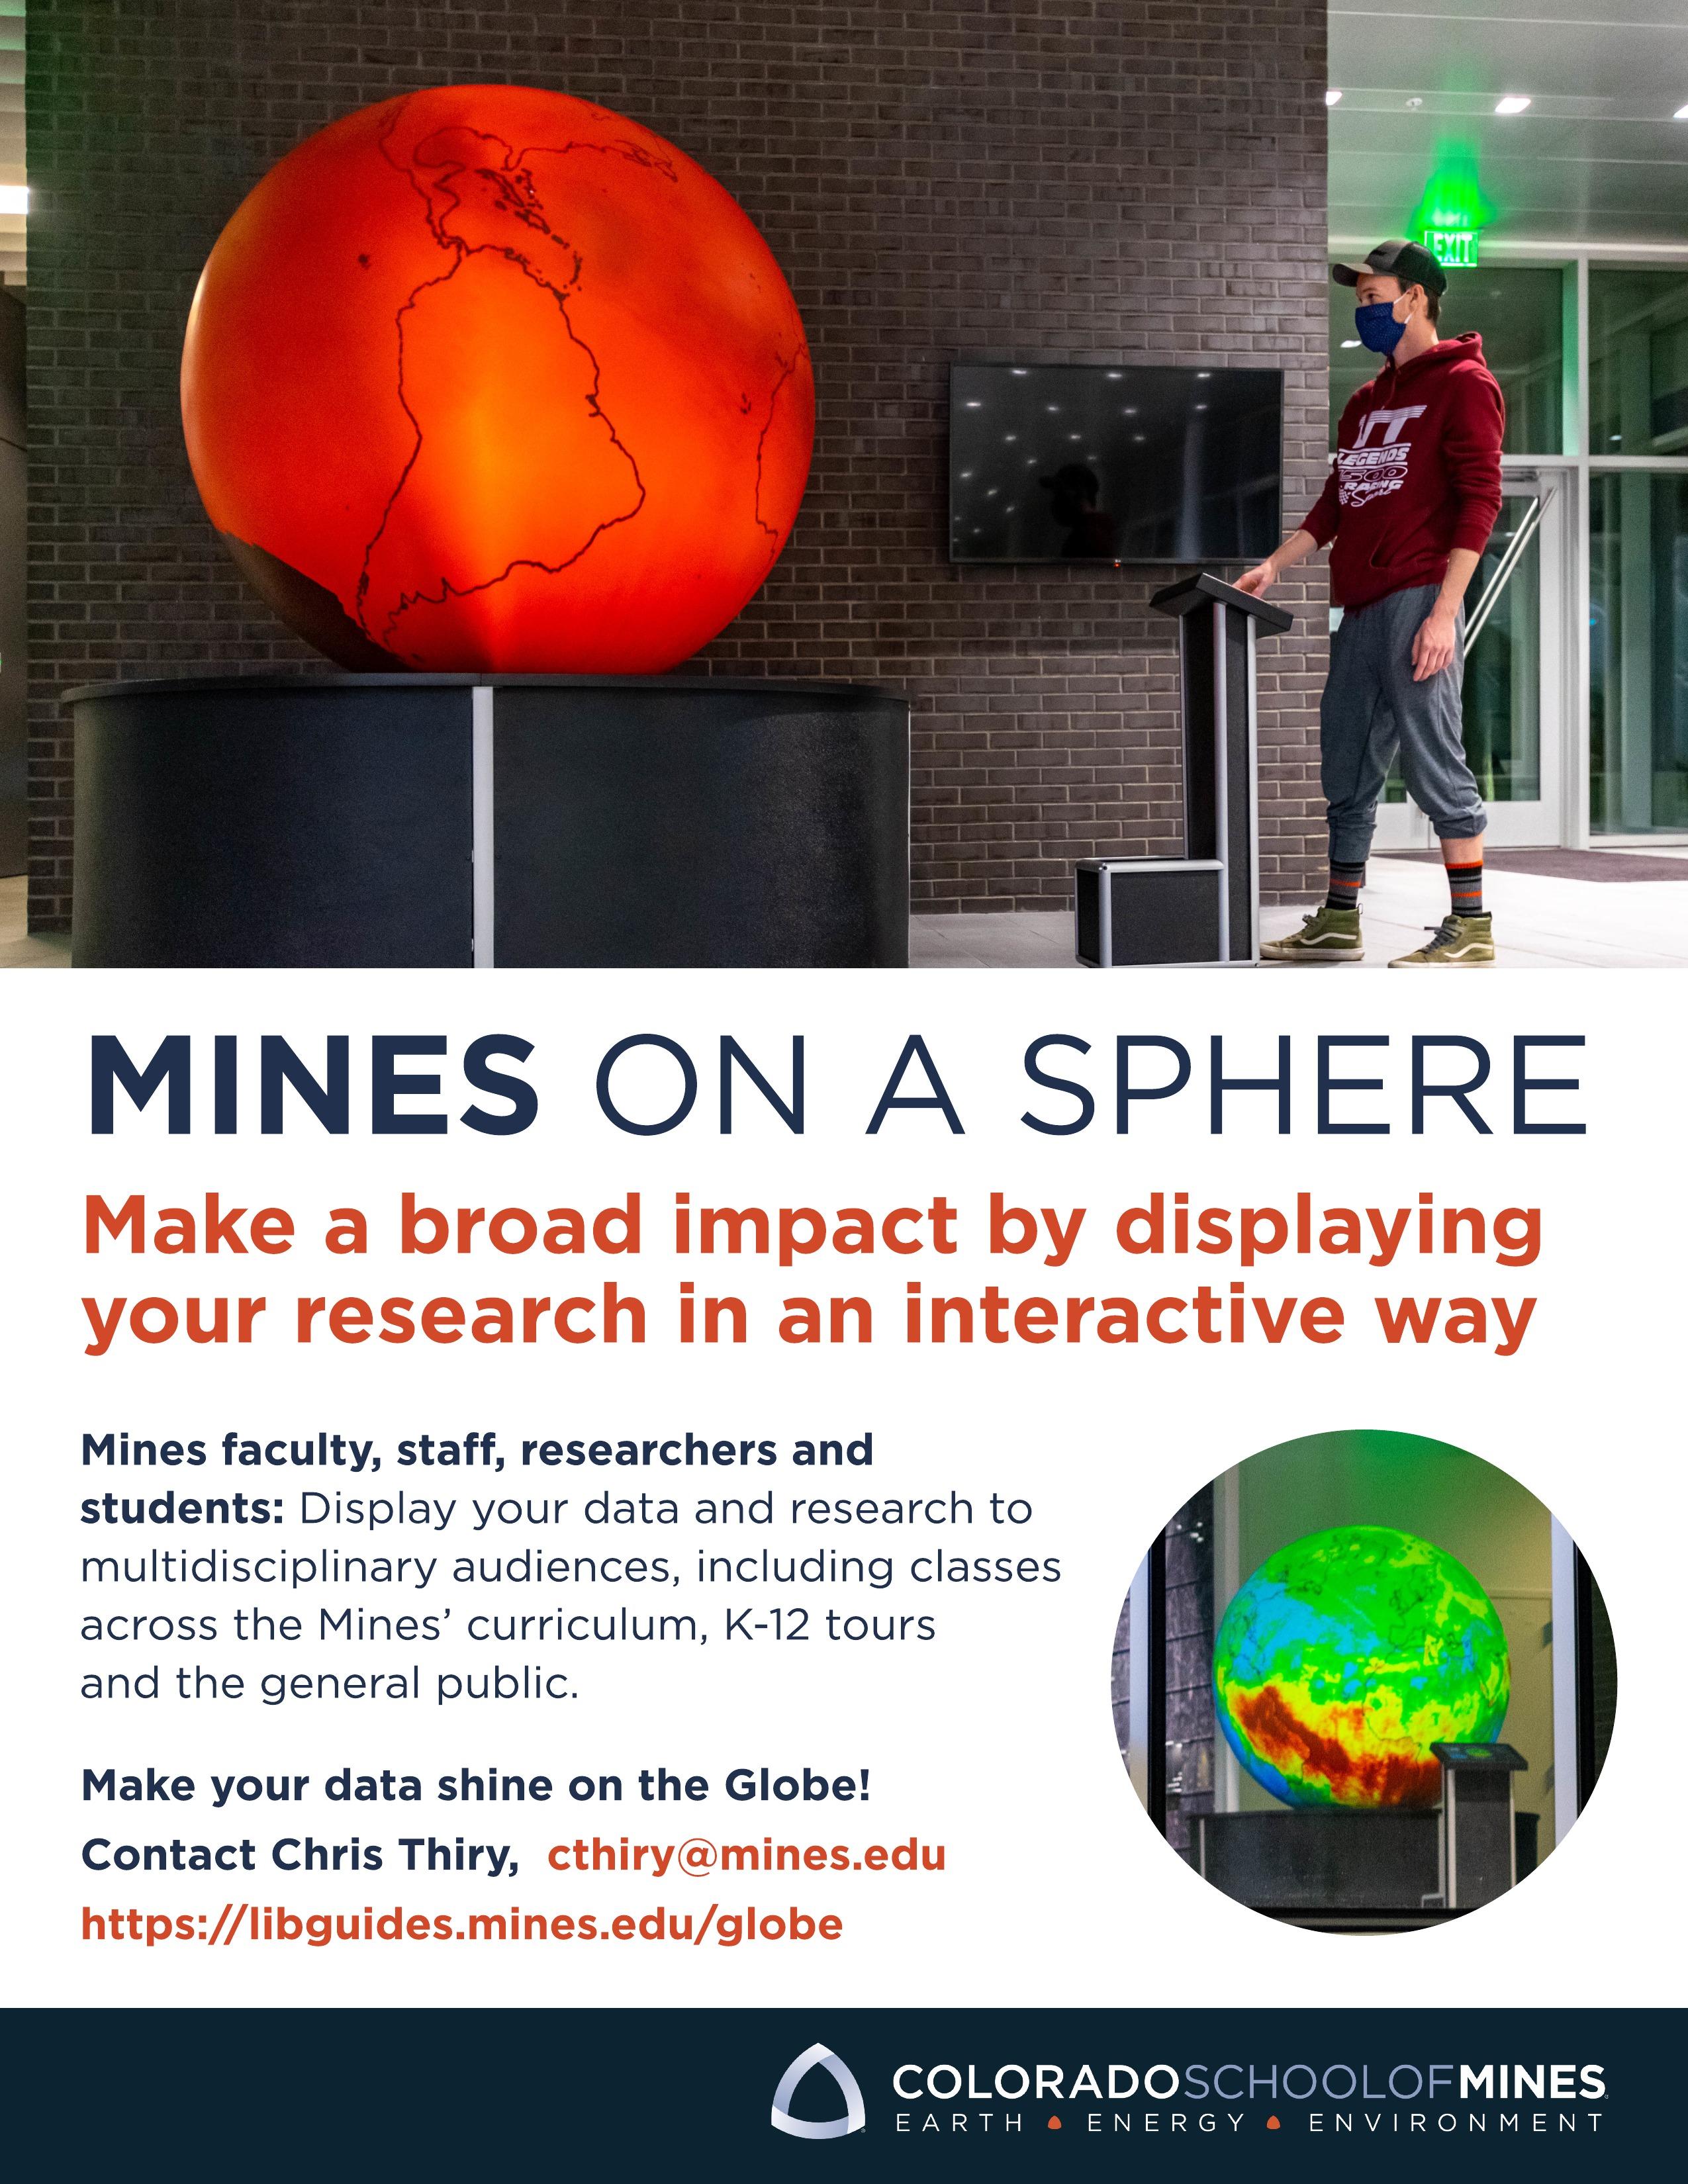 GeoDome Globe advertisement